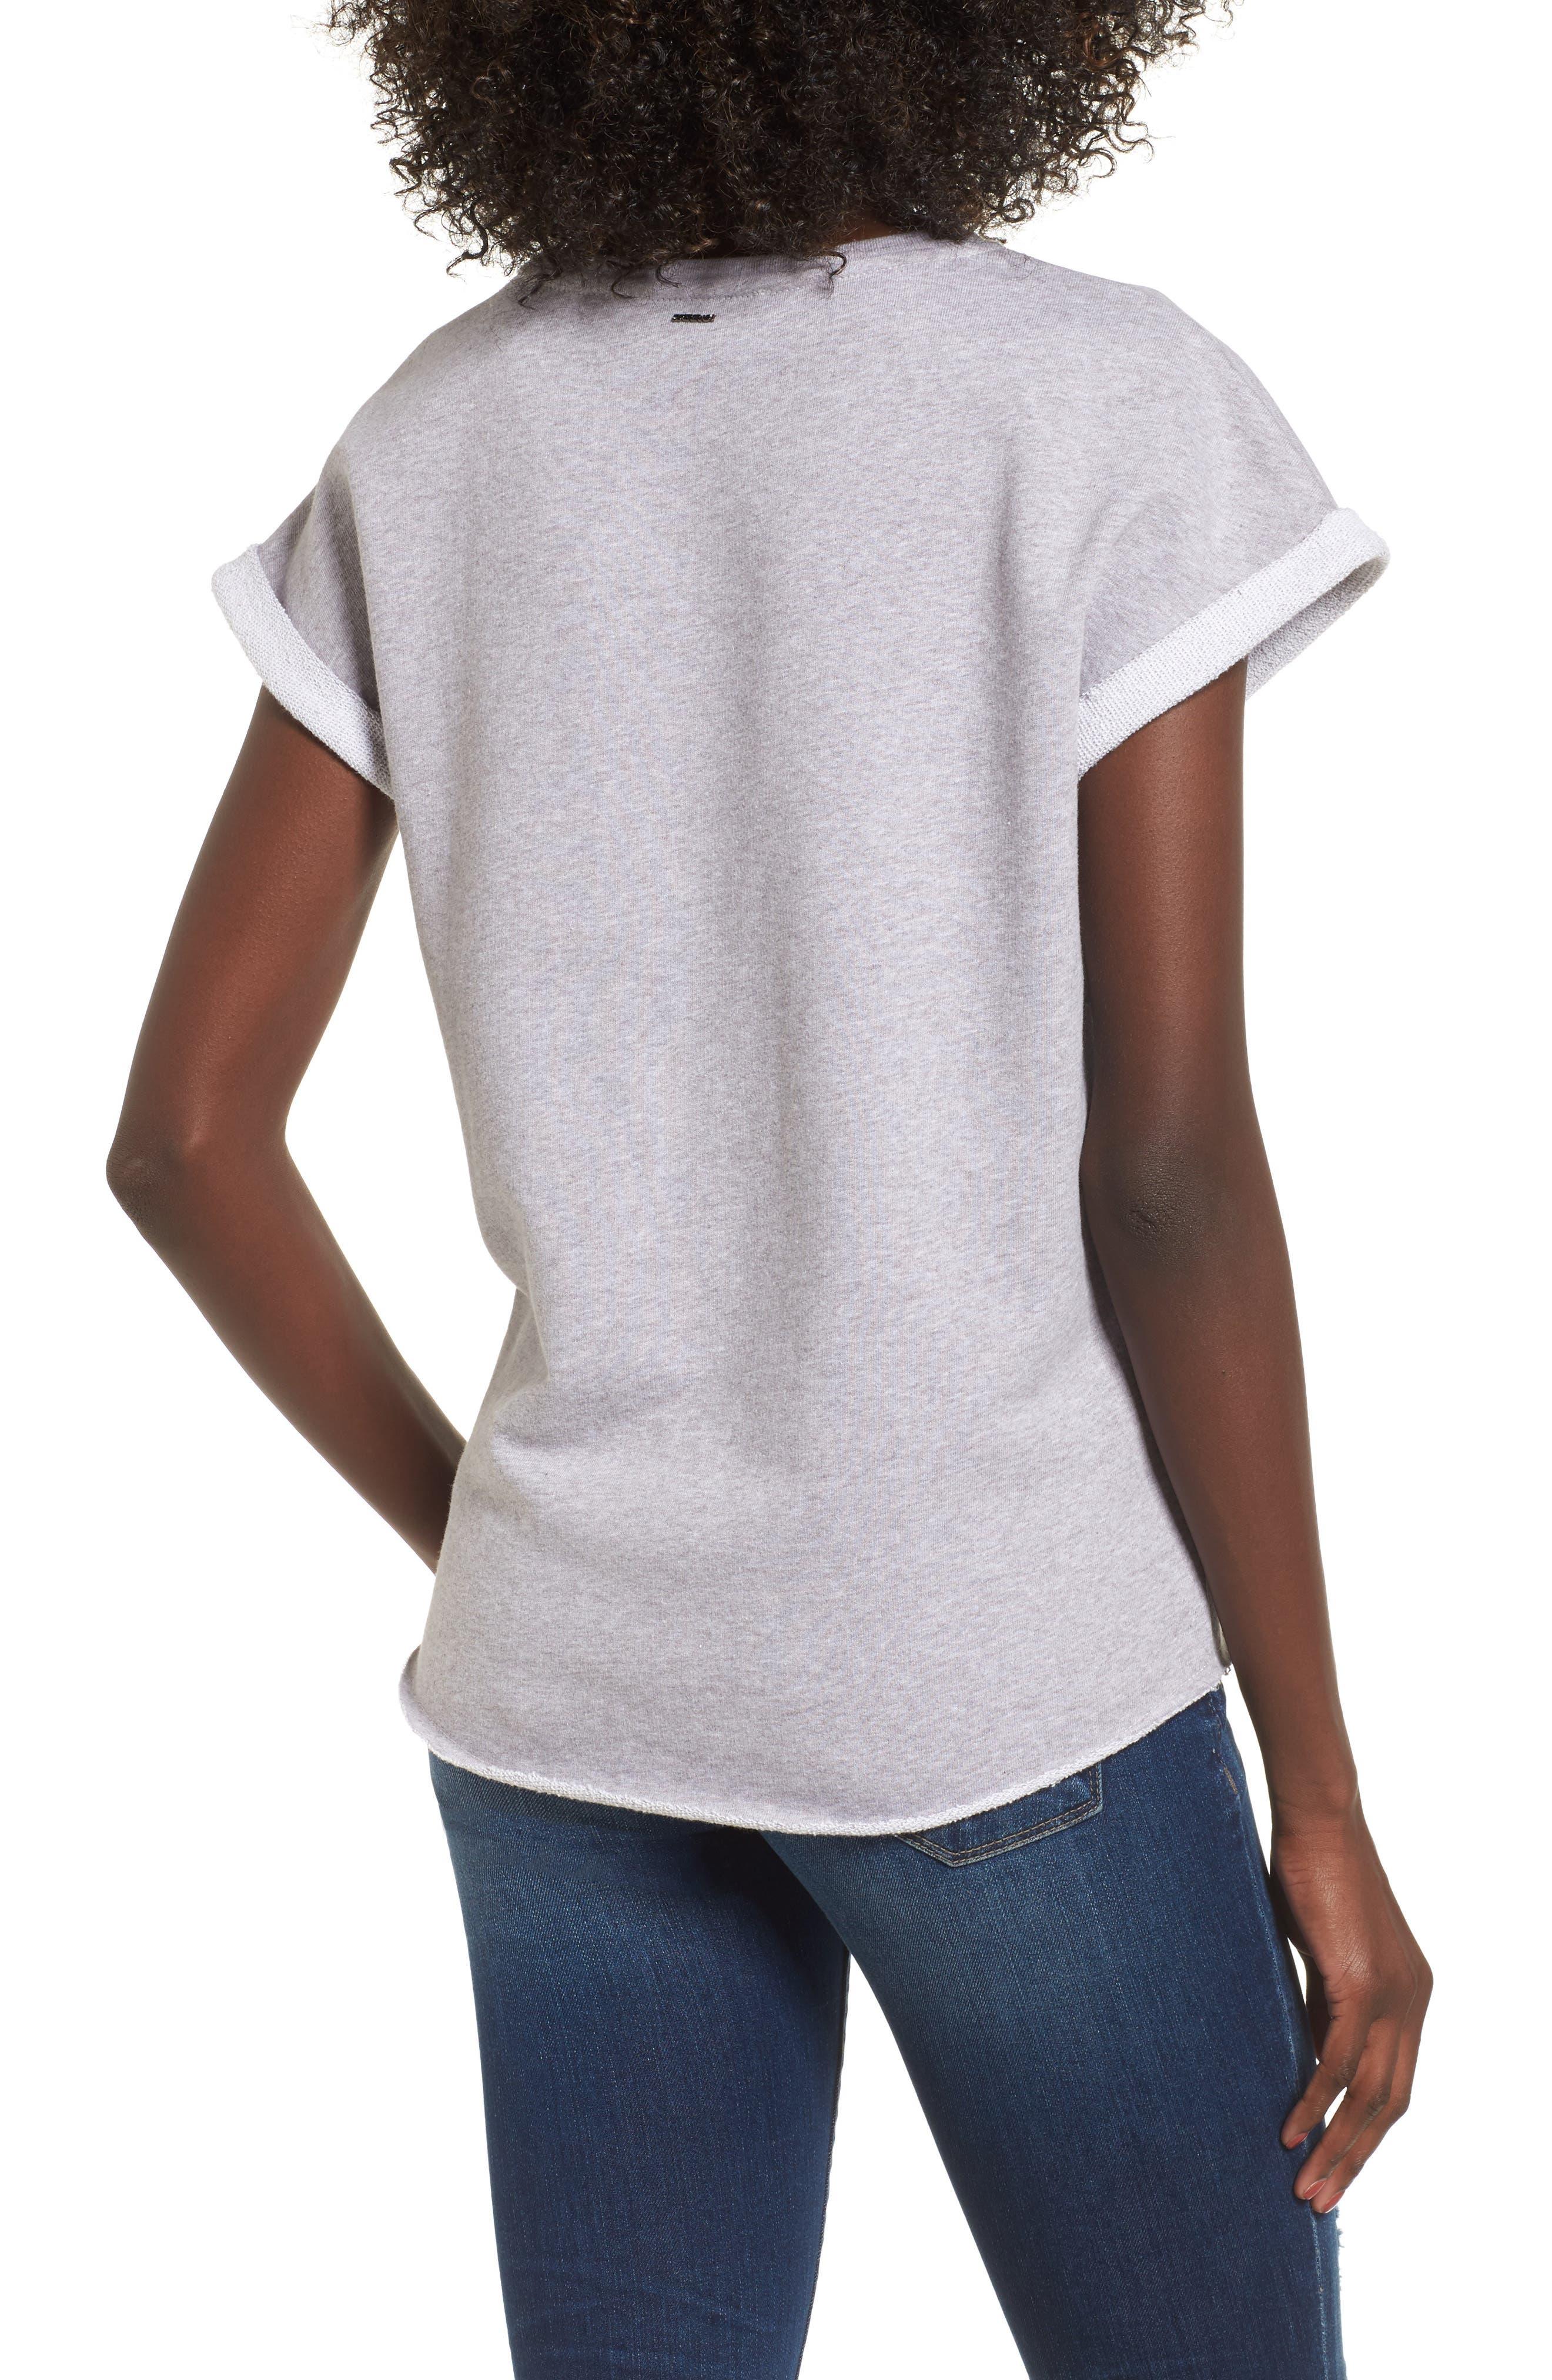 Tear Cutoff Sweatshirt,                             Alternate thumbnail 2, color,                             020